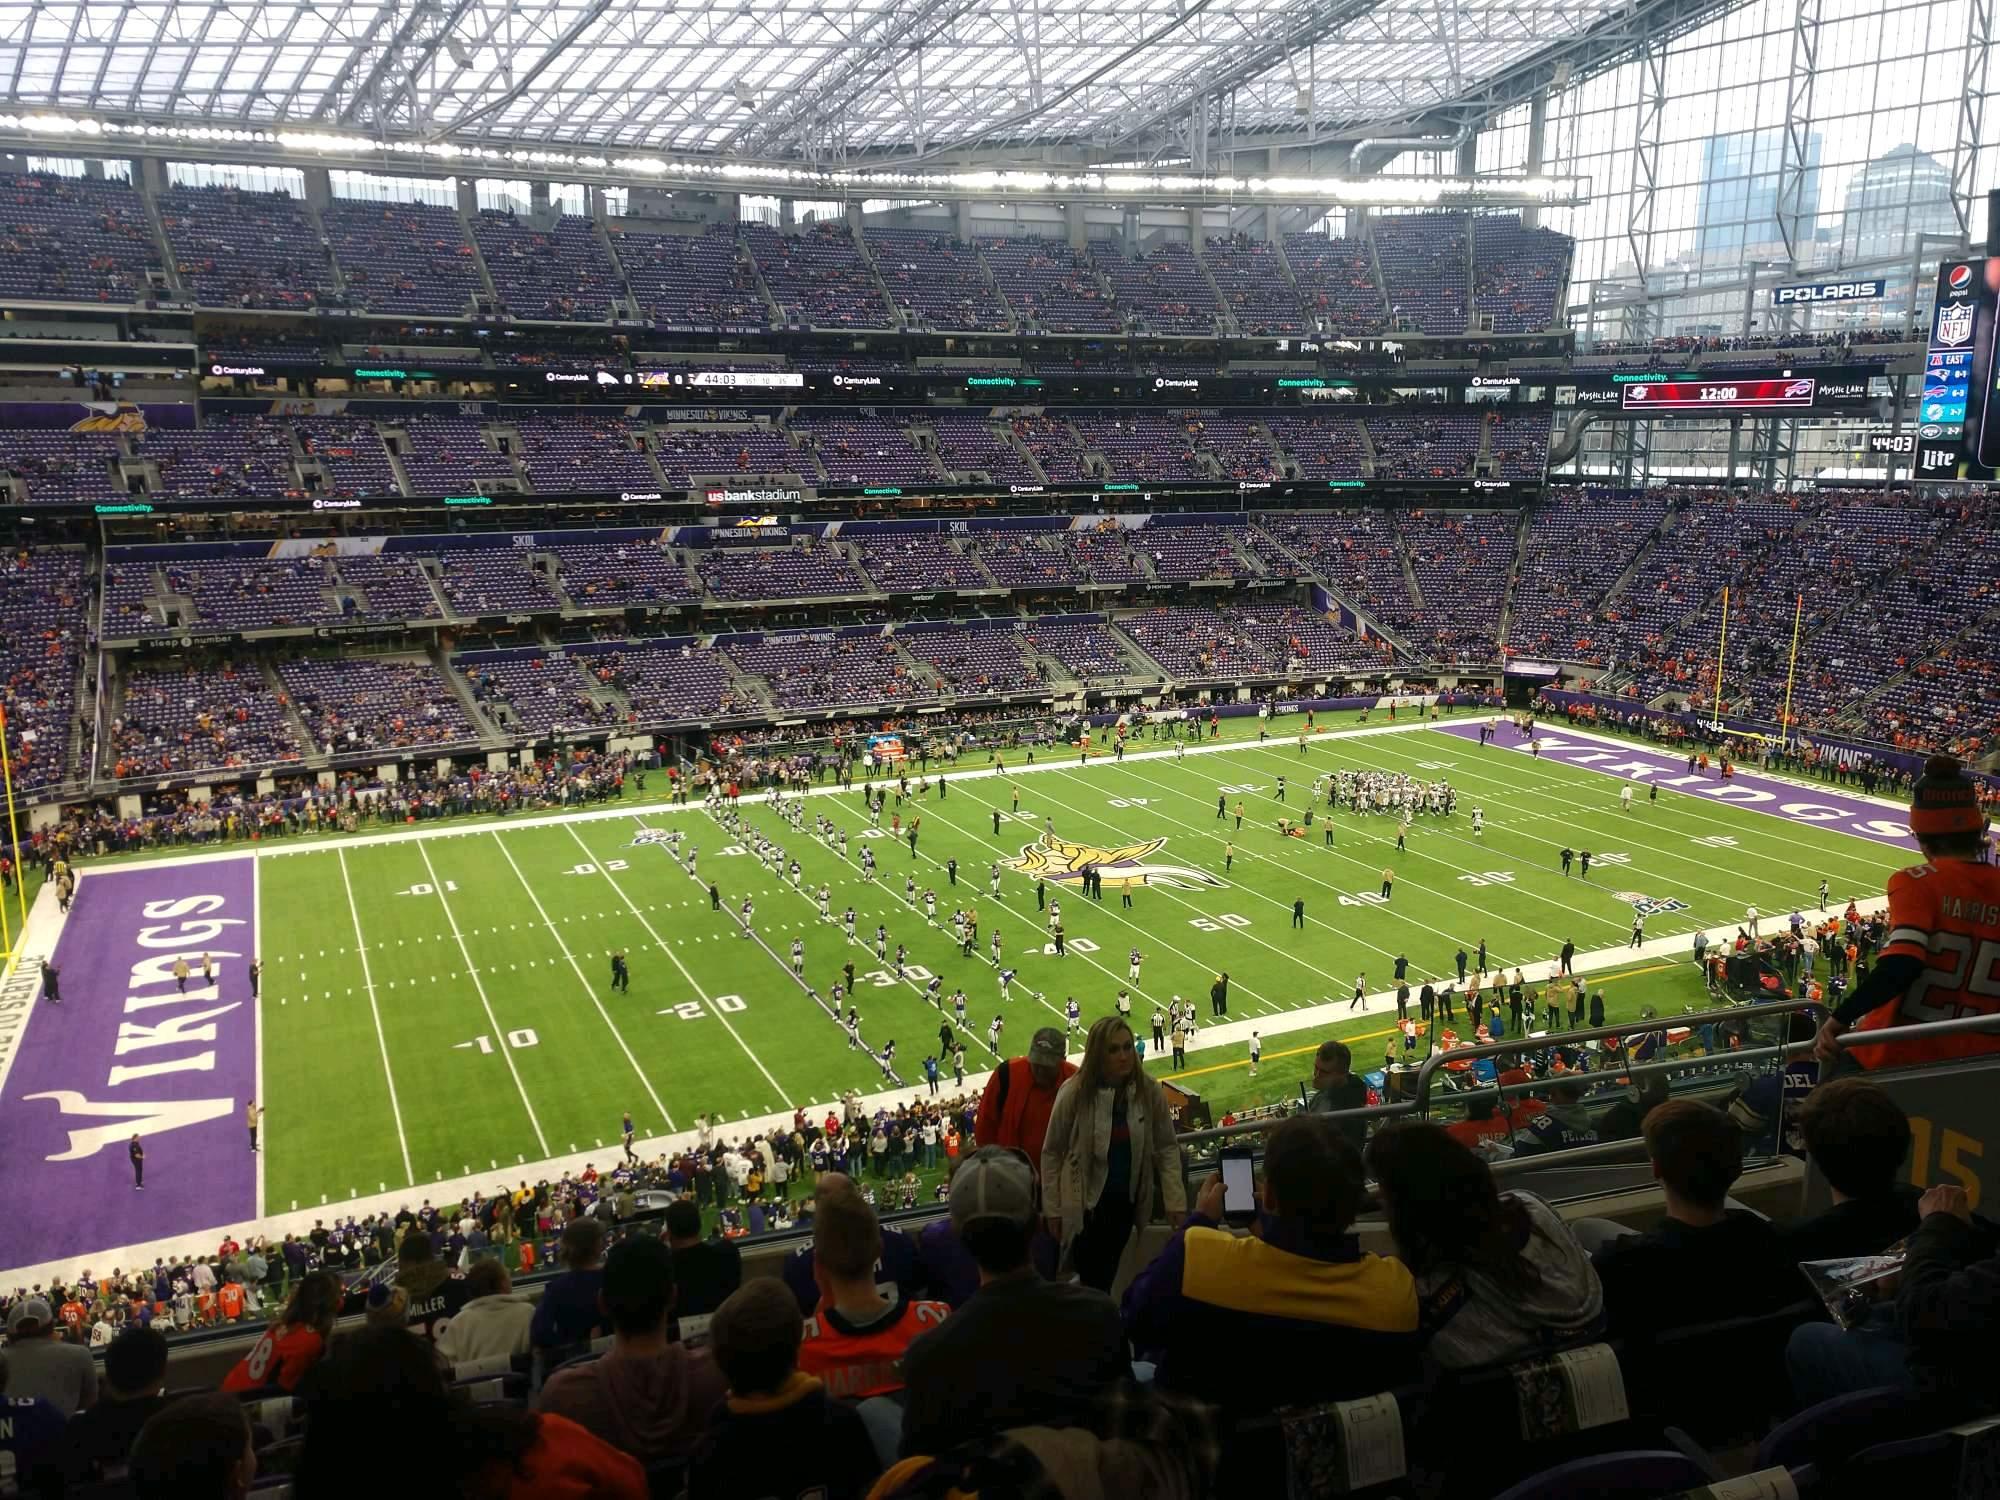 U.S. Bank Stadium Section 215 Row 11 Seat 7